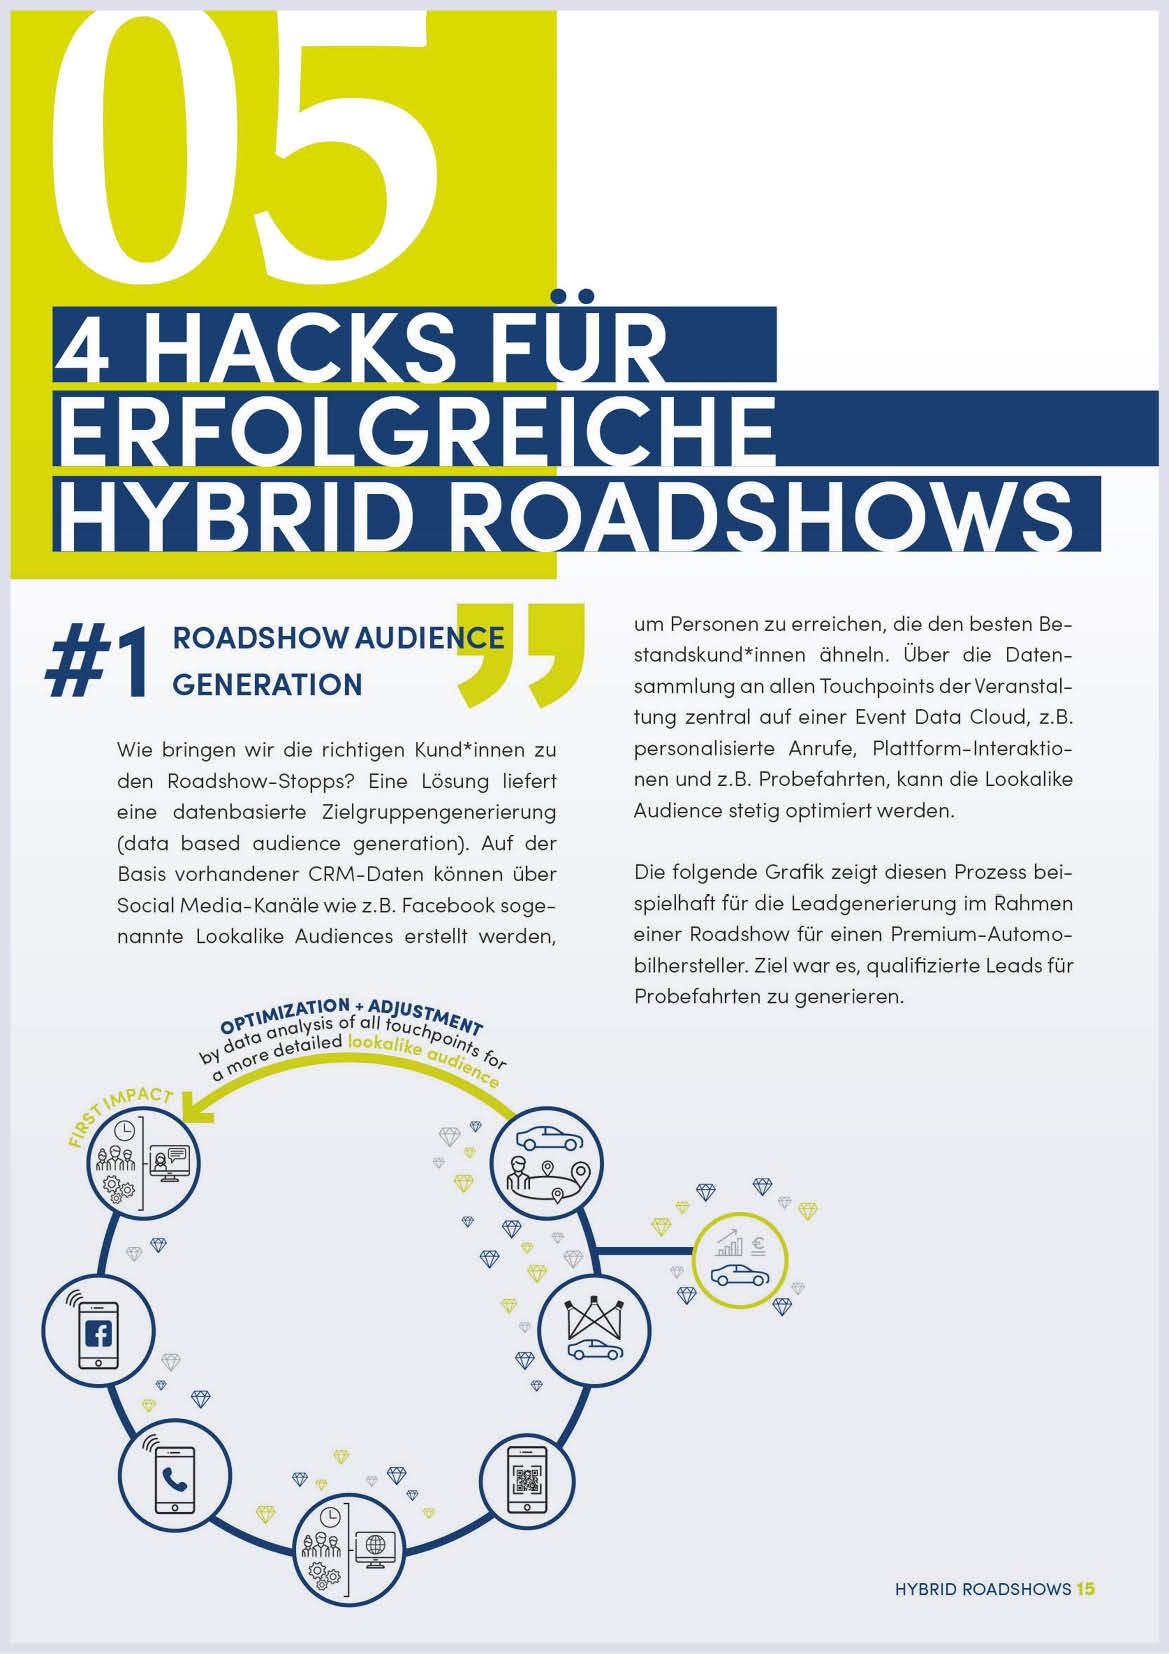 21-07-22_Whitepaper_HybridRoadshows_LandingPage_4